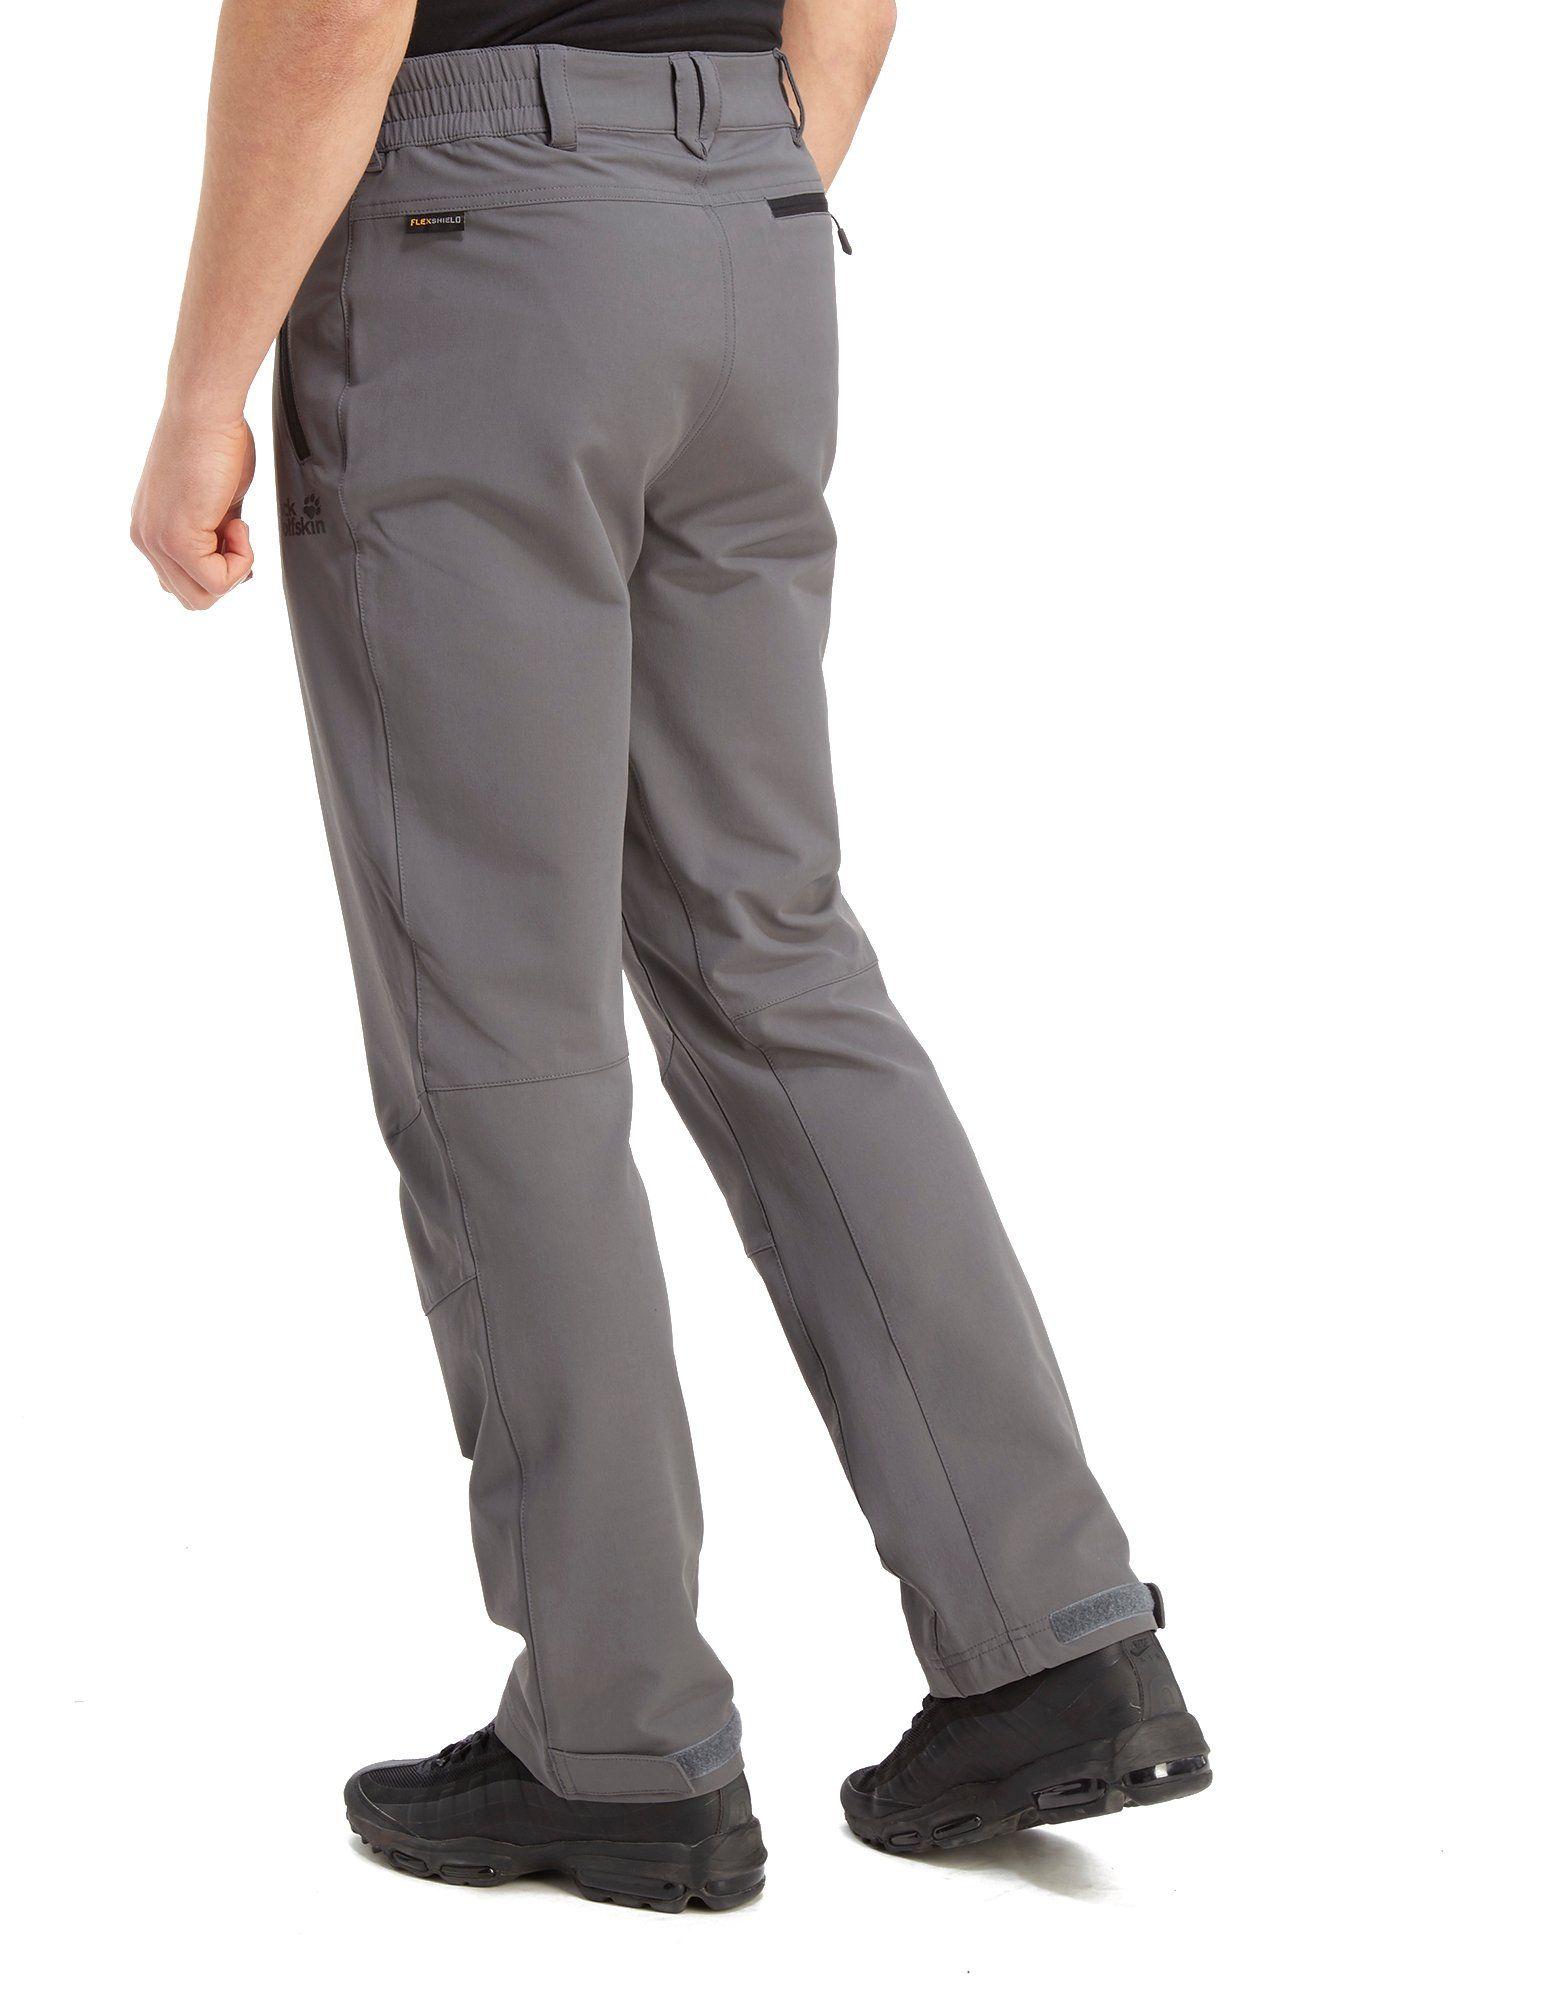 Jack Wolfskin Softshell Trousers Grau